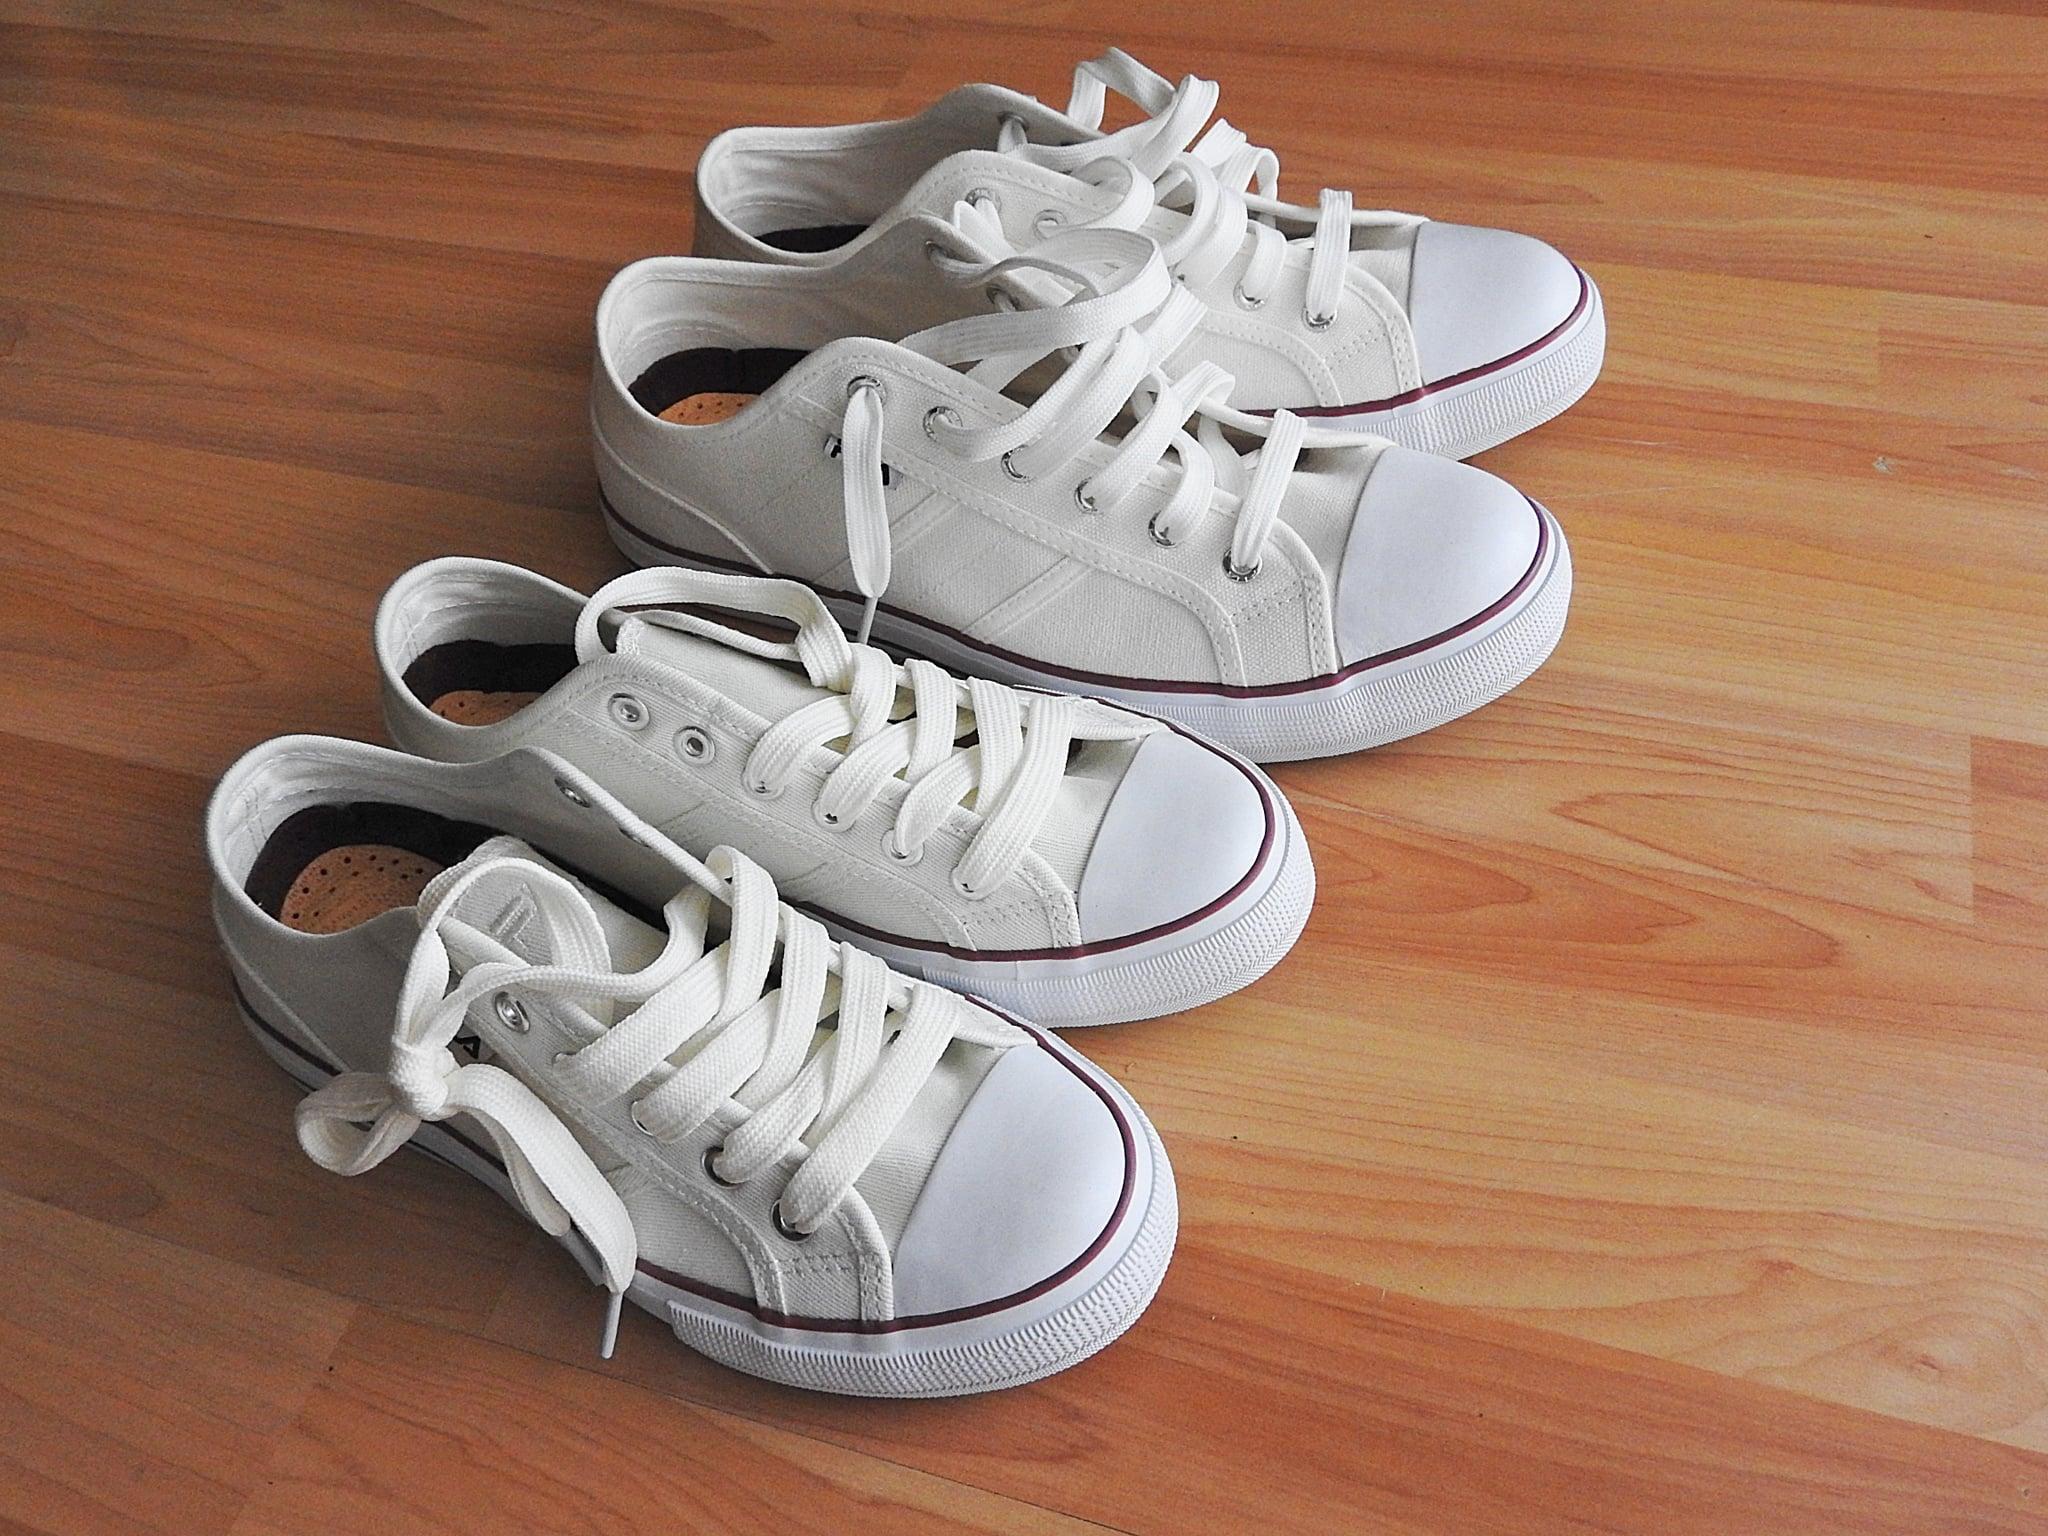 How to Keep Kids' White Shoes White